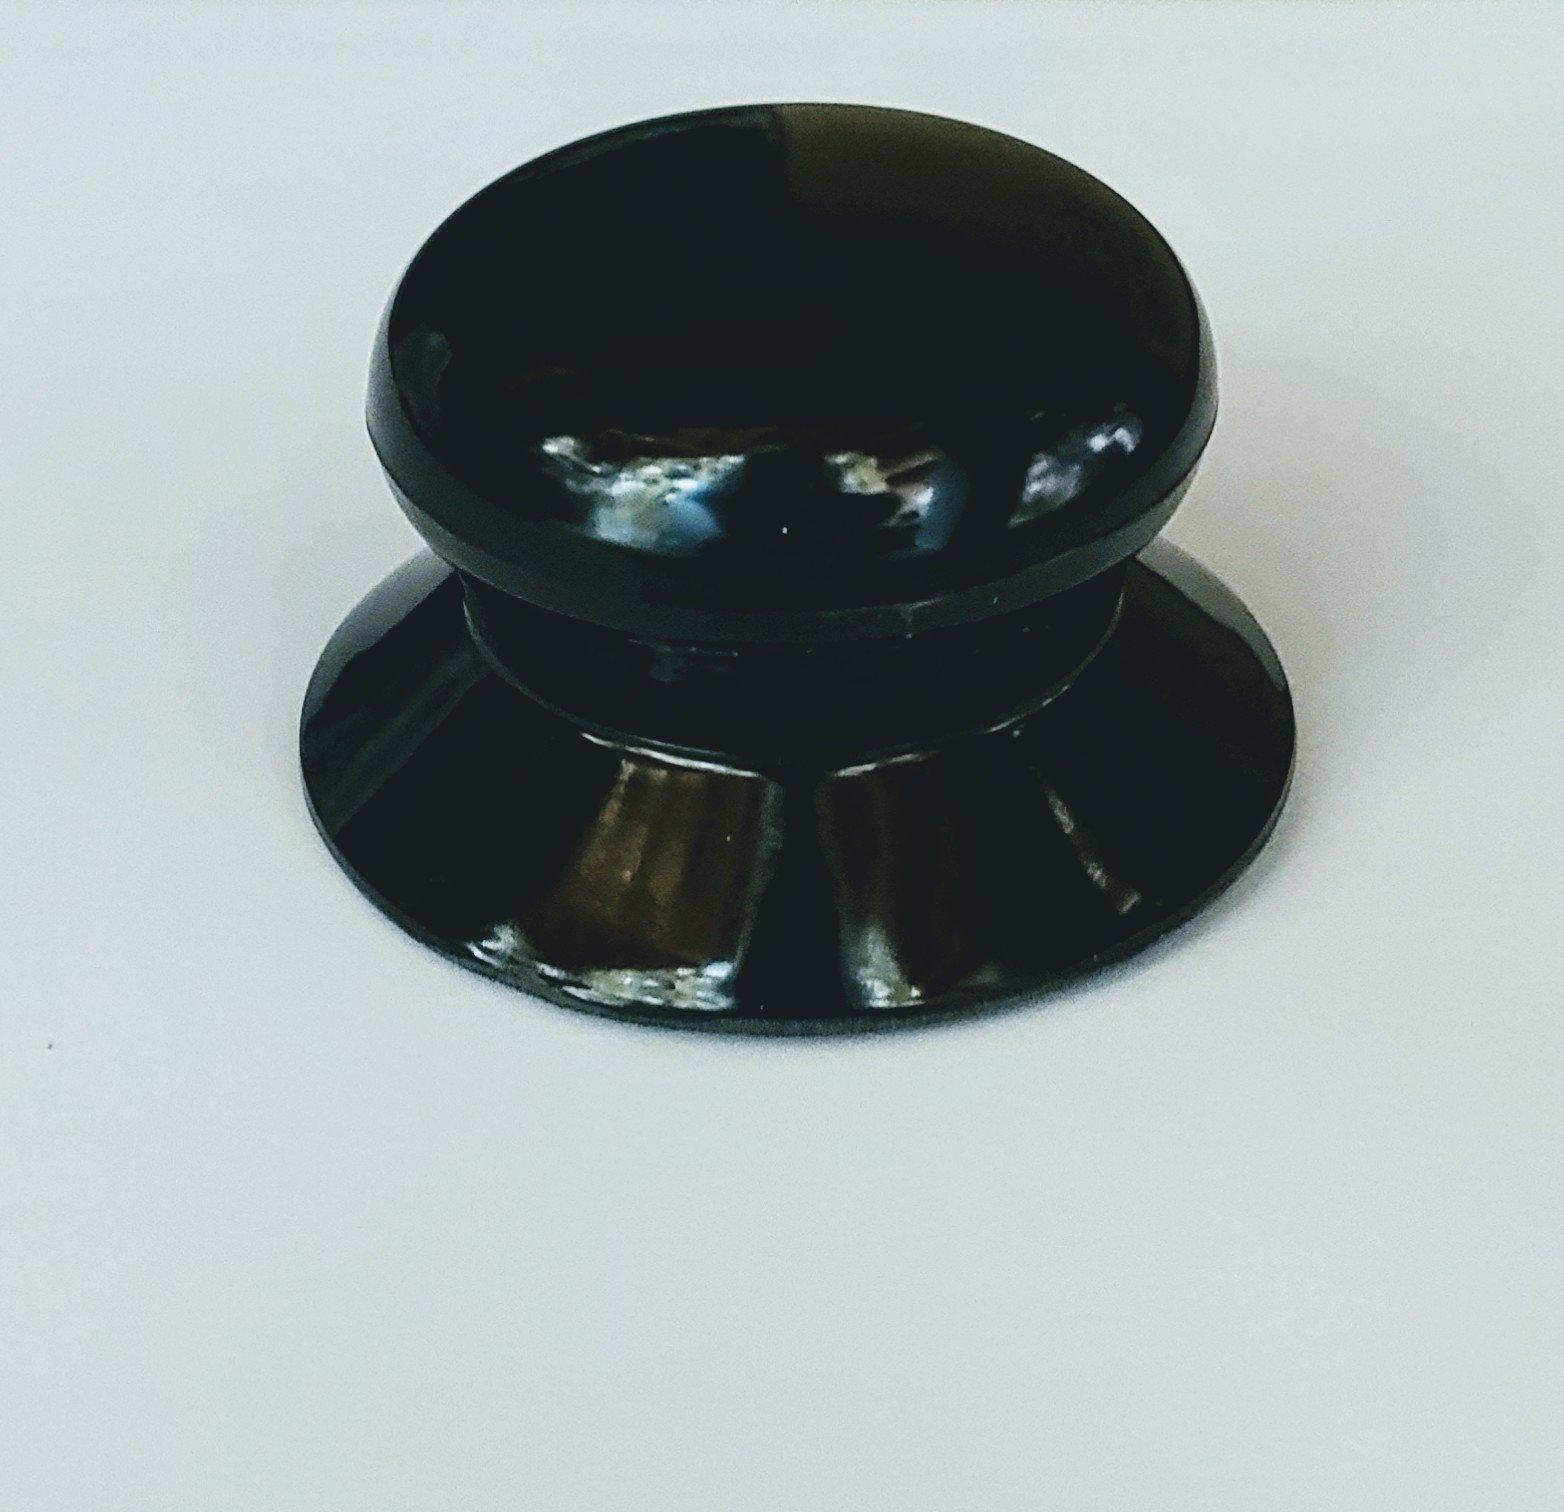 Presto Multi-Cooker/Crock Pot Lid Knob